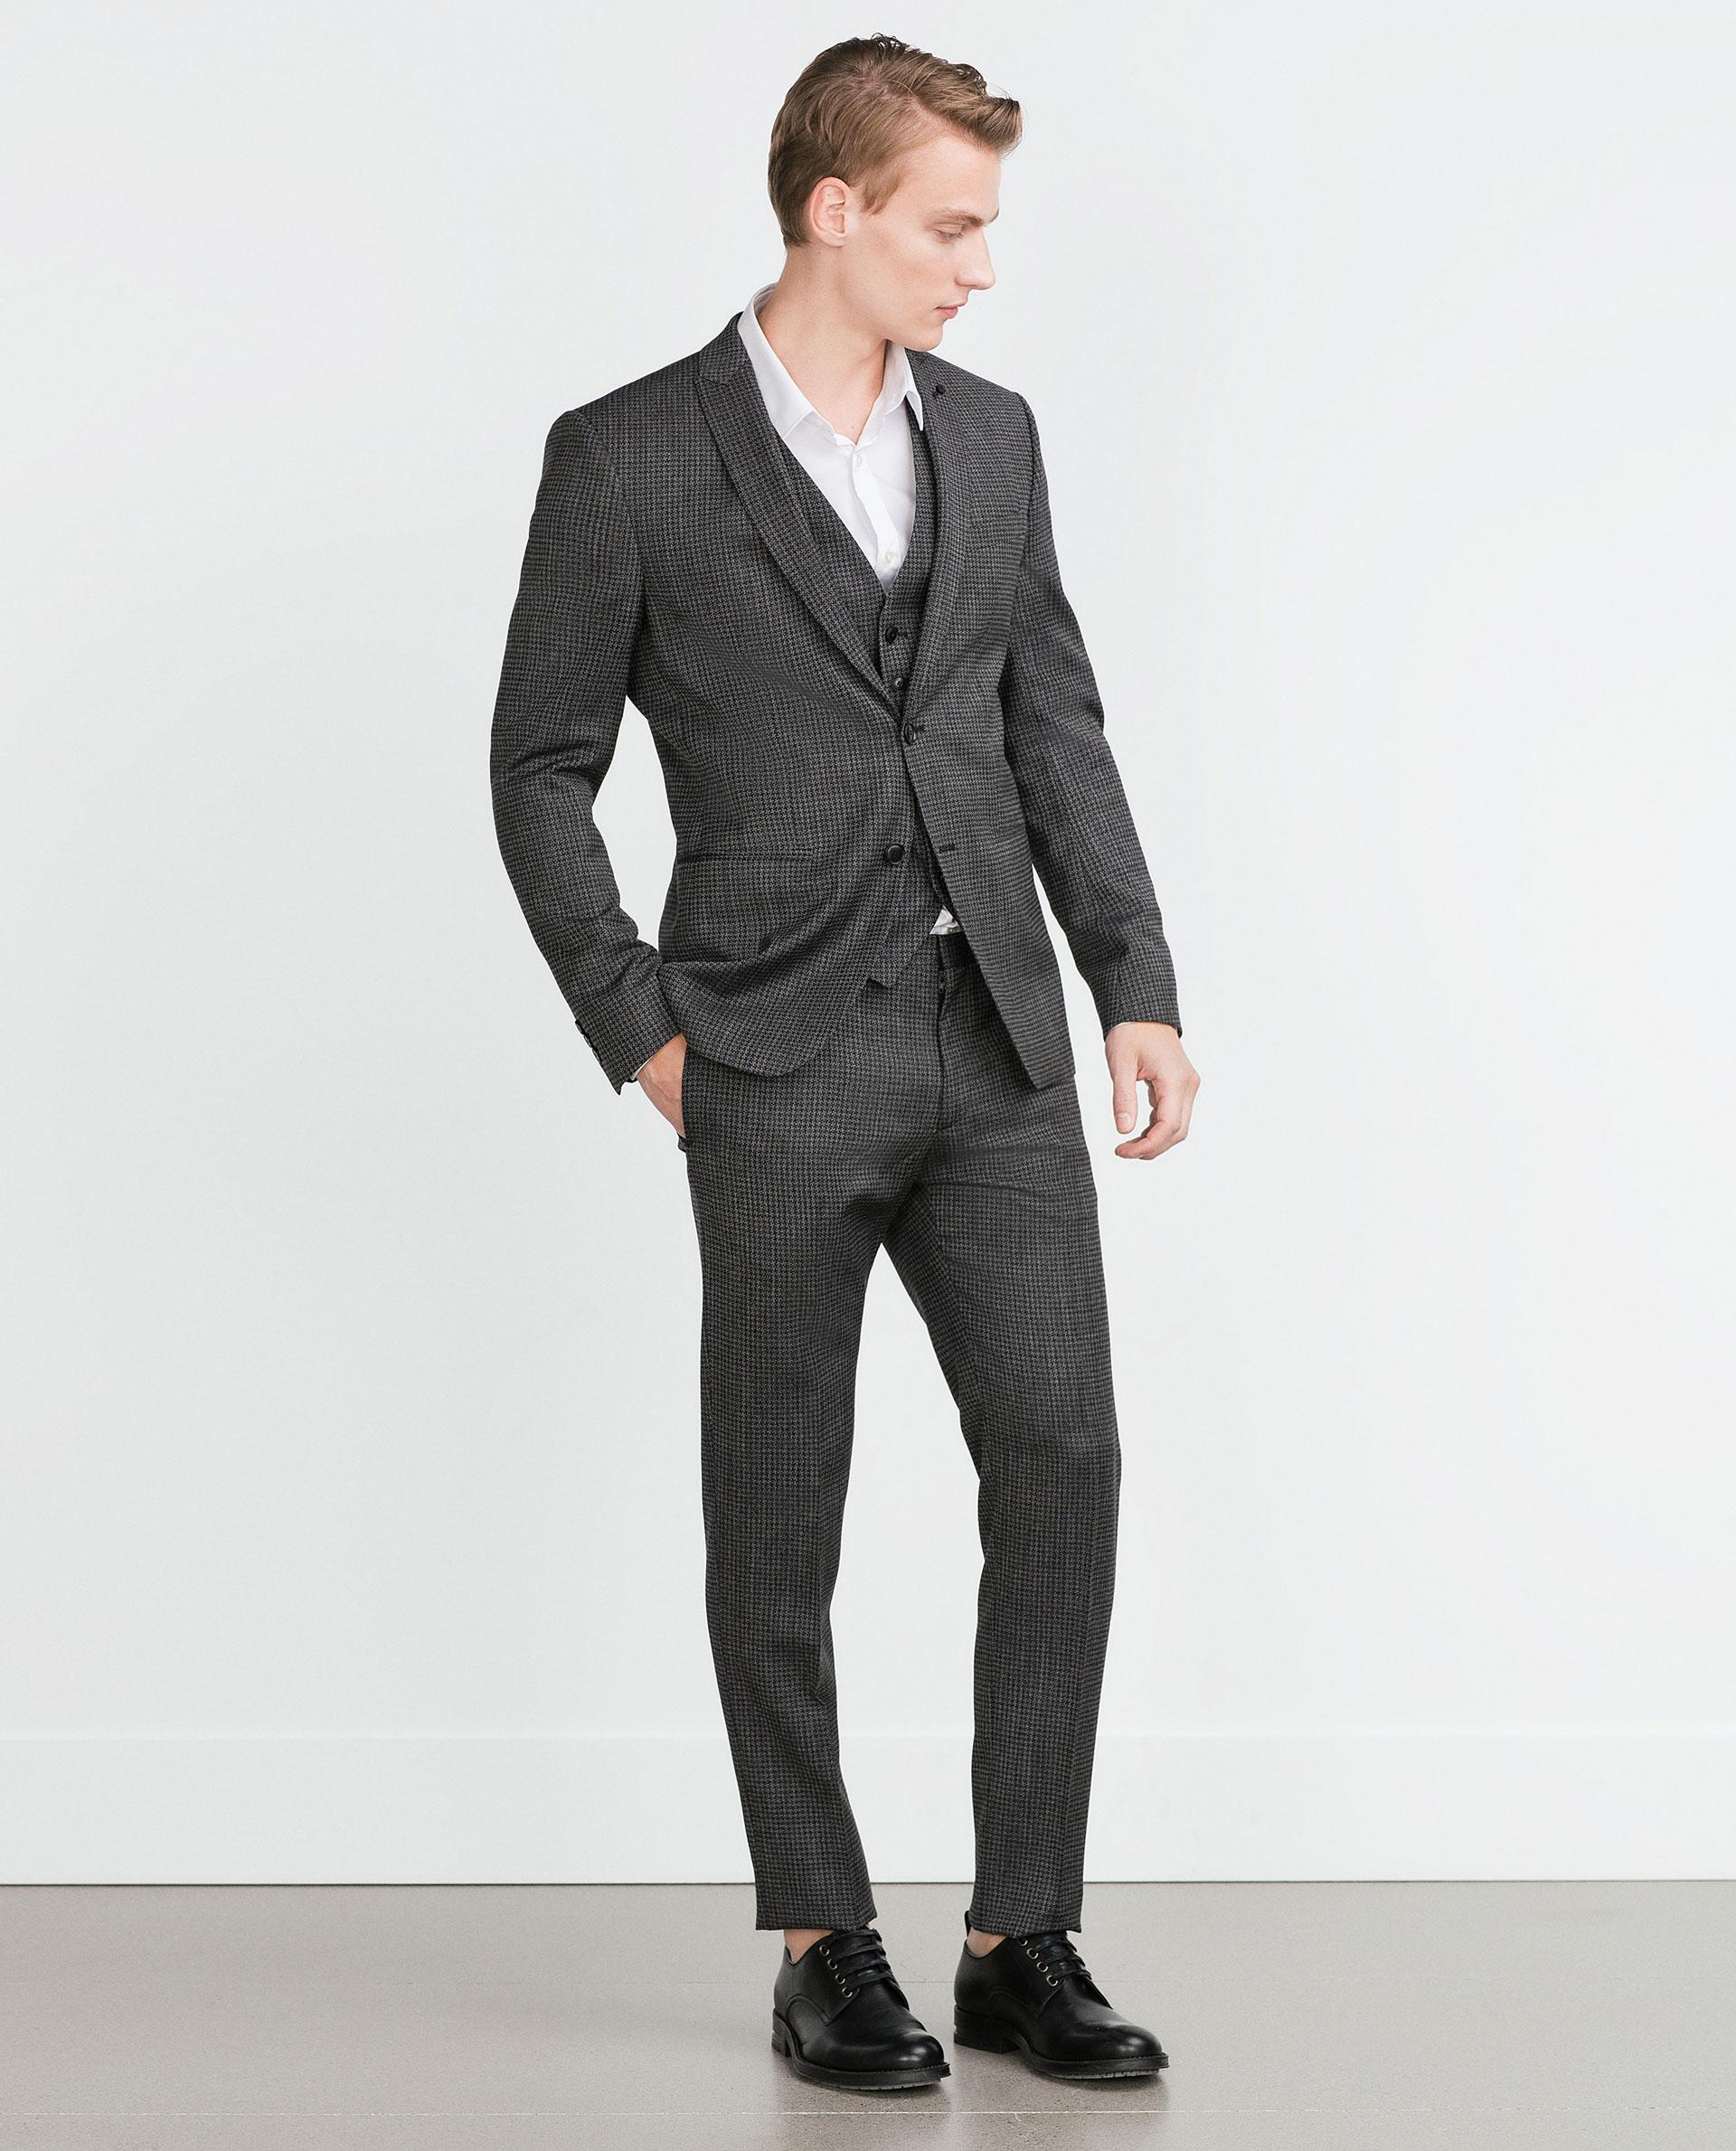 Dark Grey Wool Suit Dress Yy